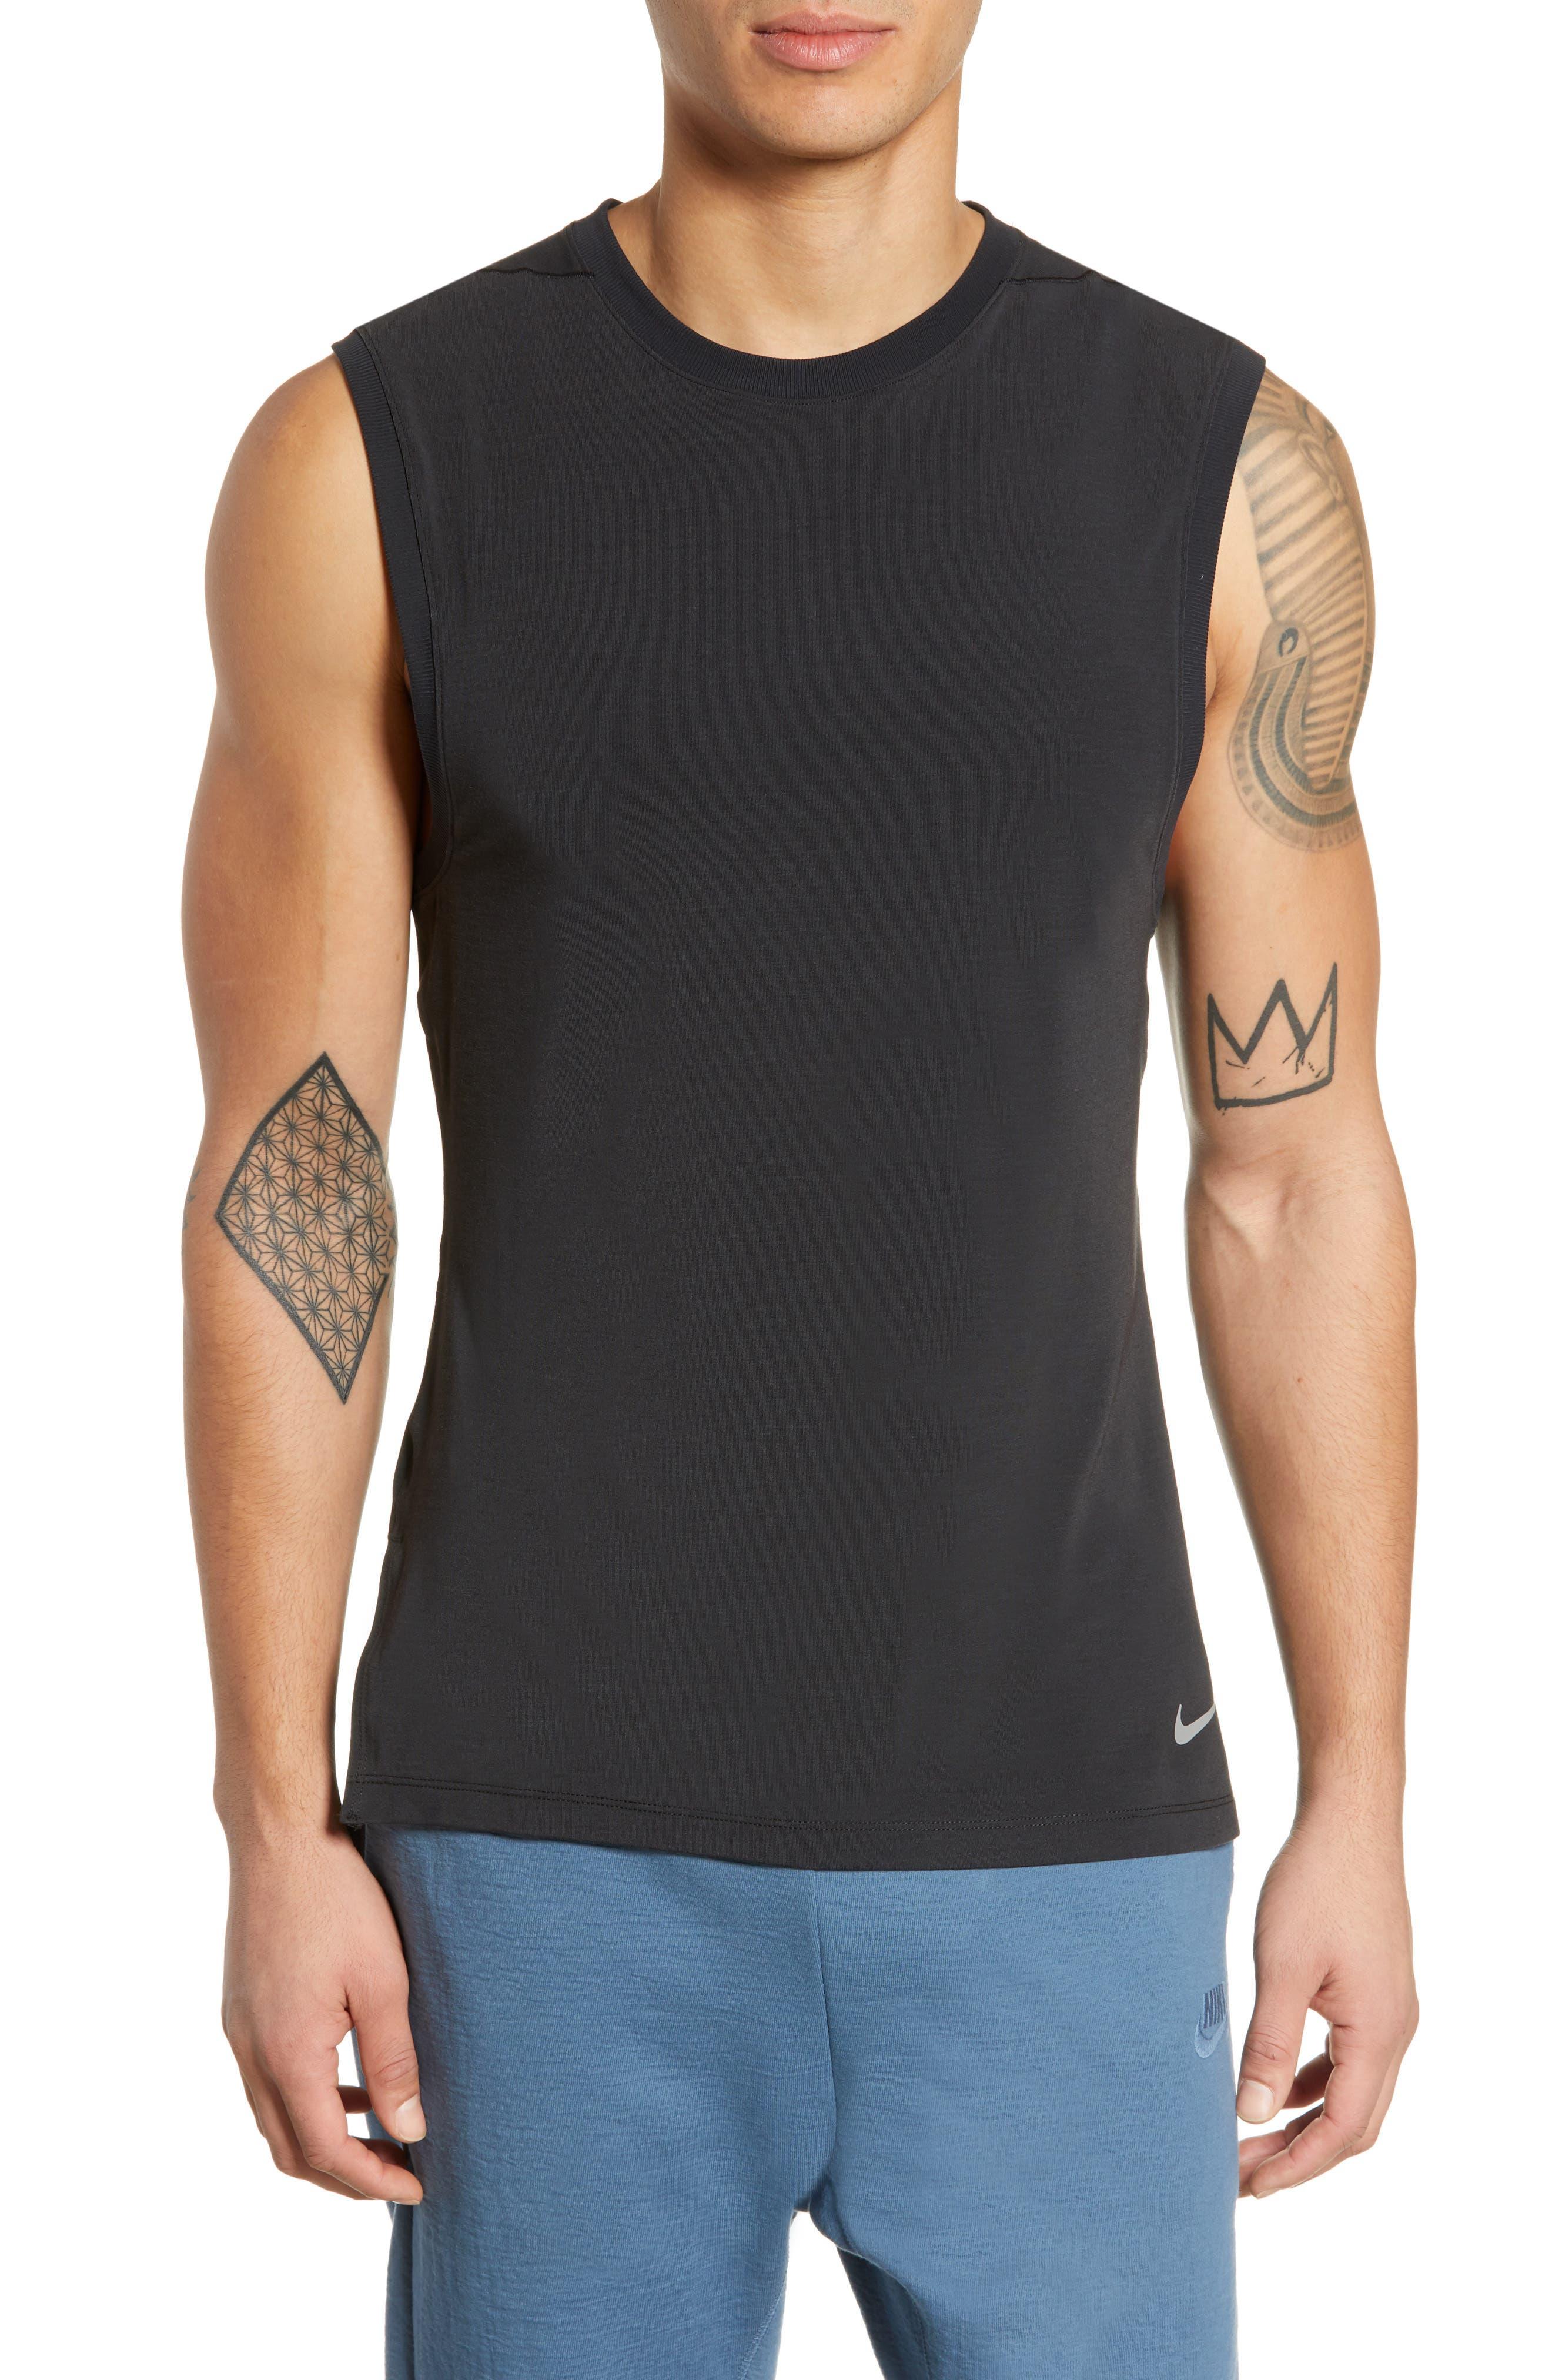 Nike Dry Transcent Sleeveless T-Shirt Black